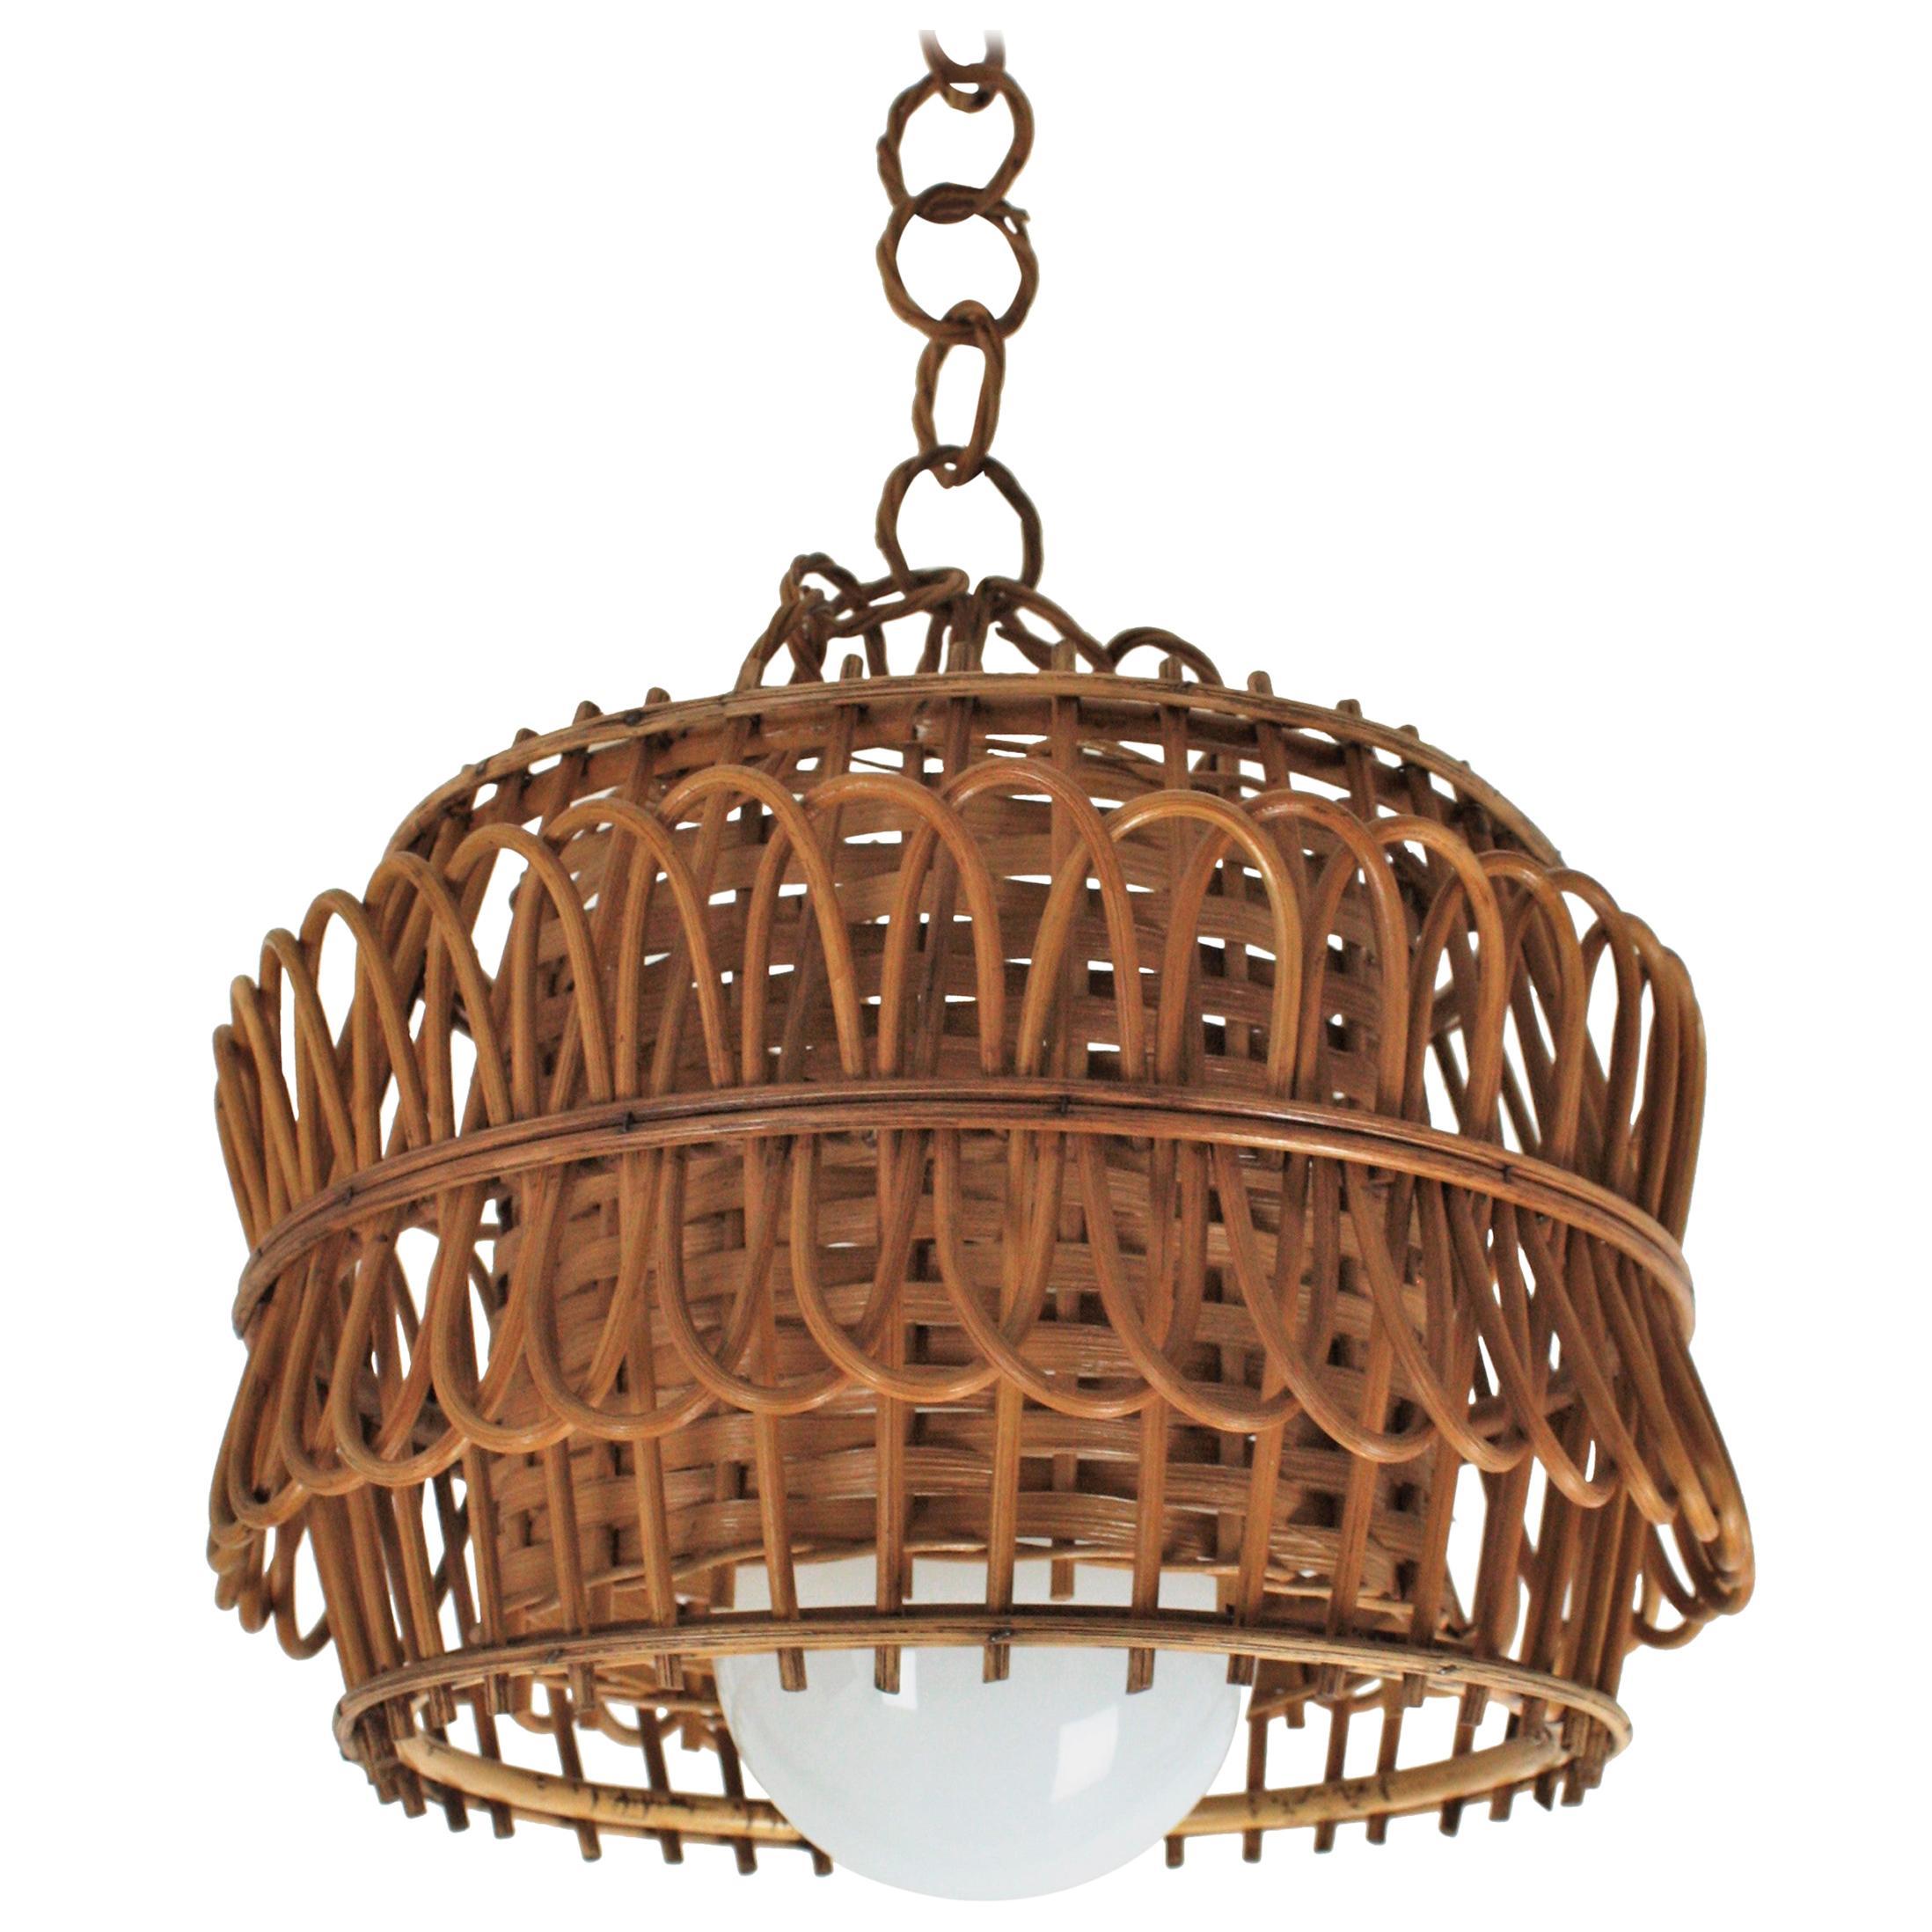 Spanish Modernist Rattan Pendant Lamp / Hanging Light with Woven Wicker Shade